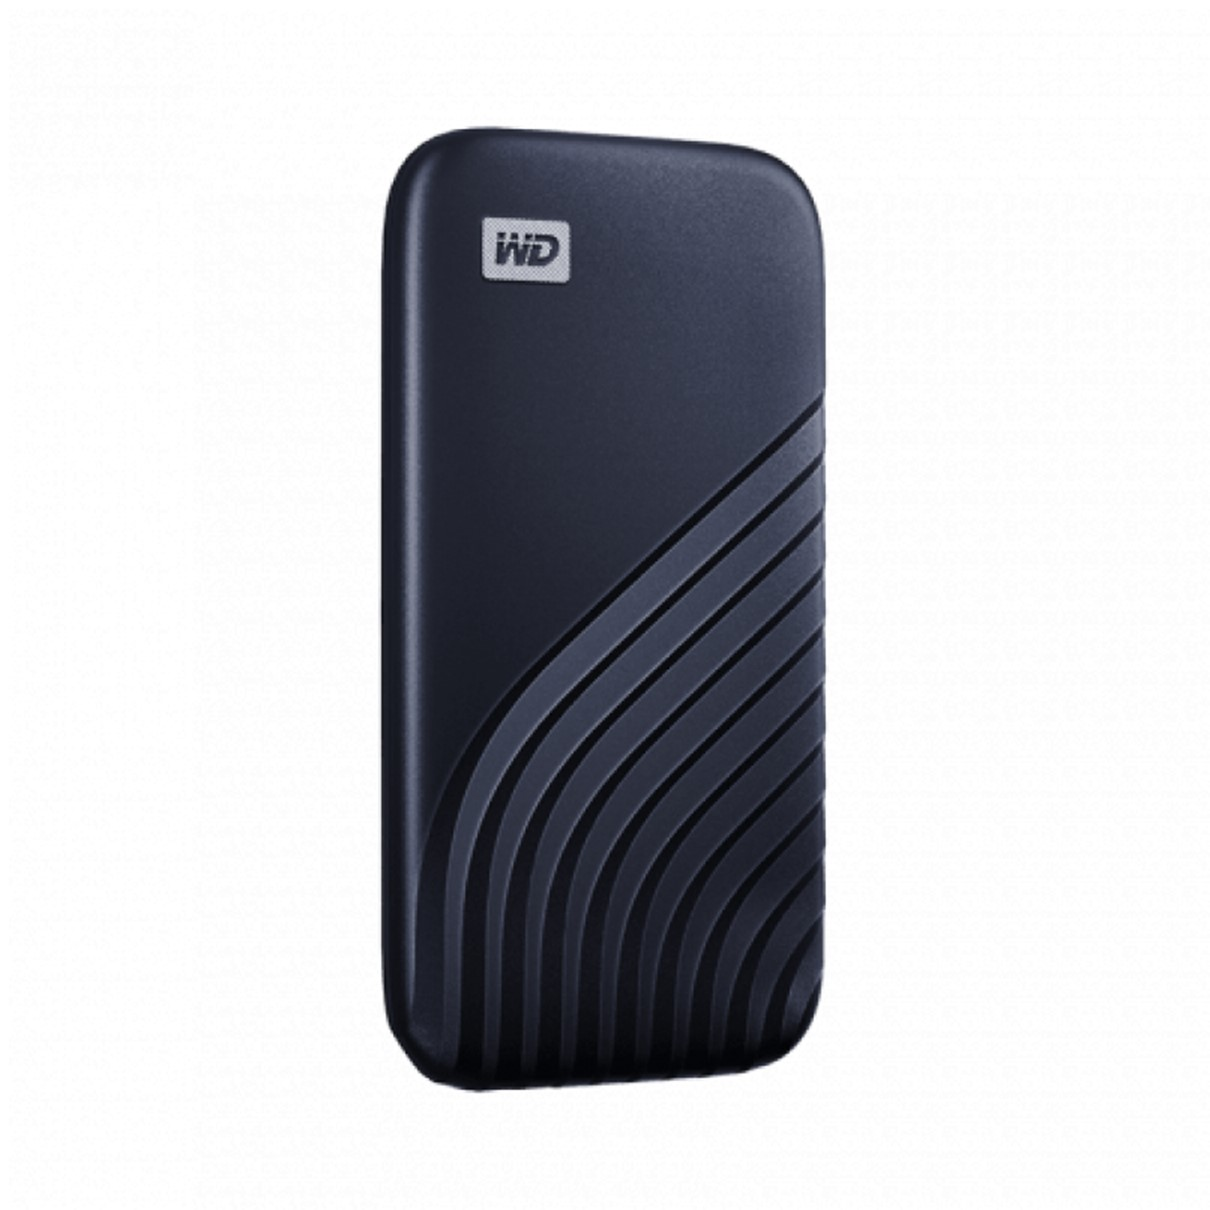 Disco duro externo hdd wd western digital 1tb my passport ssd usb - c space gray